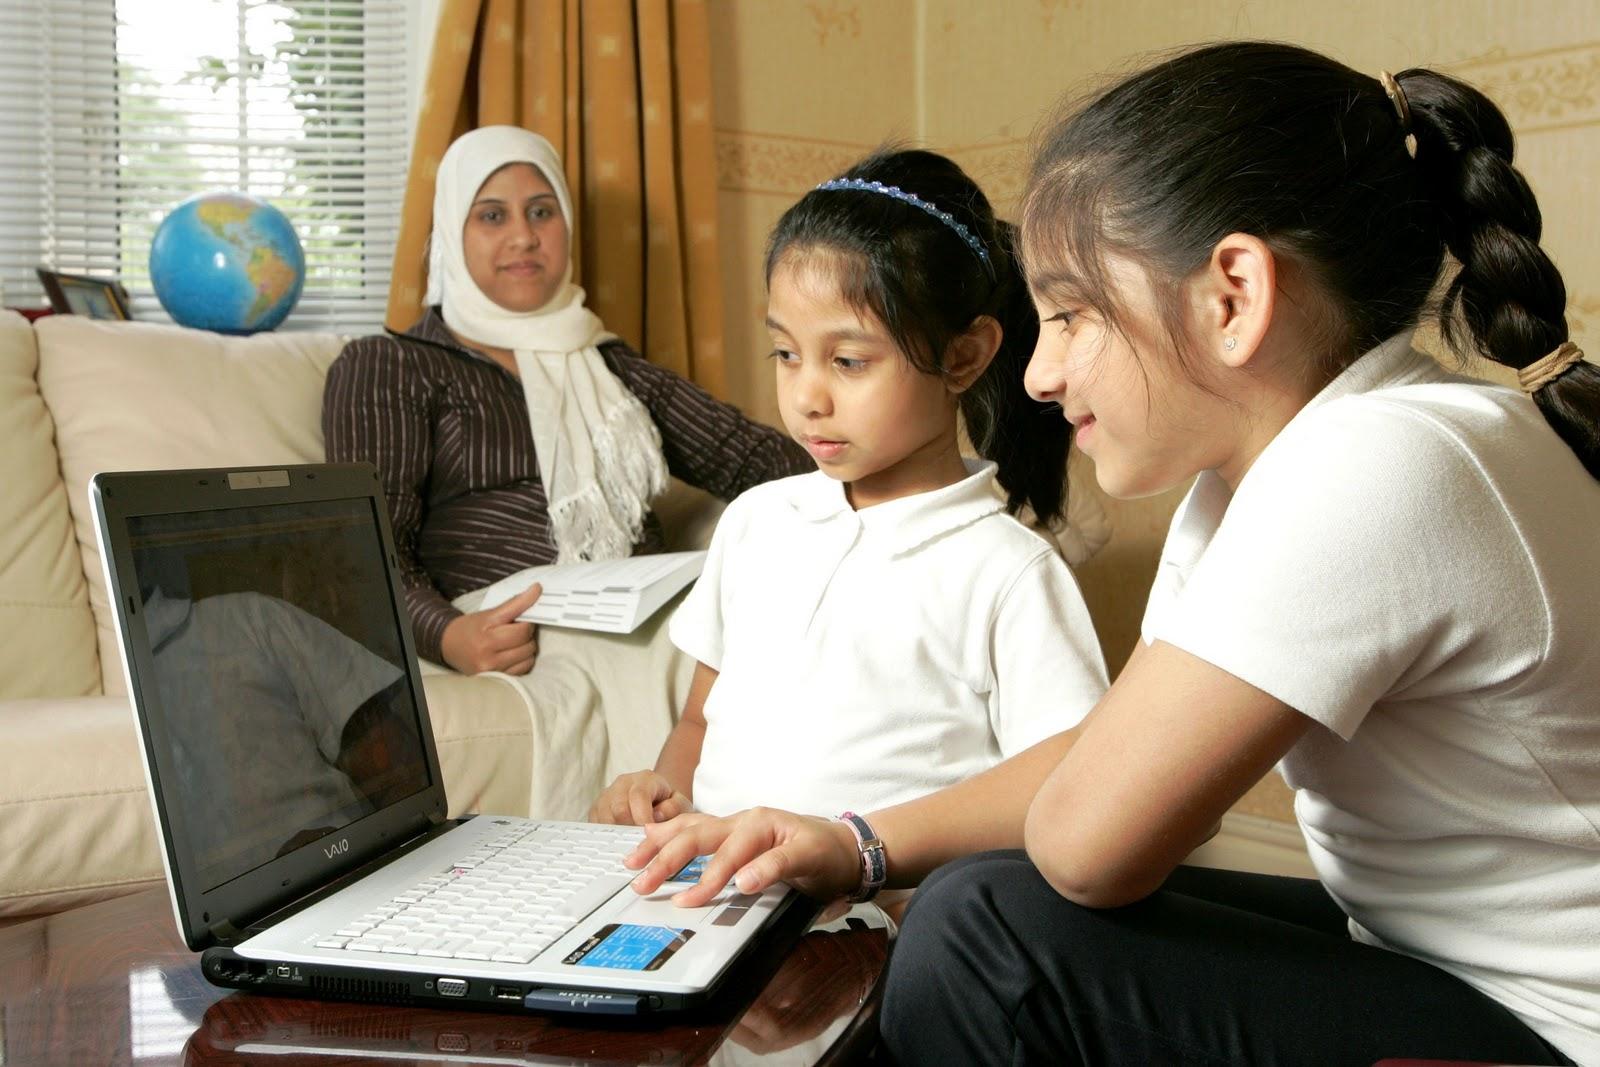 Orangtua Belajar 'Melepas' Anak